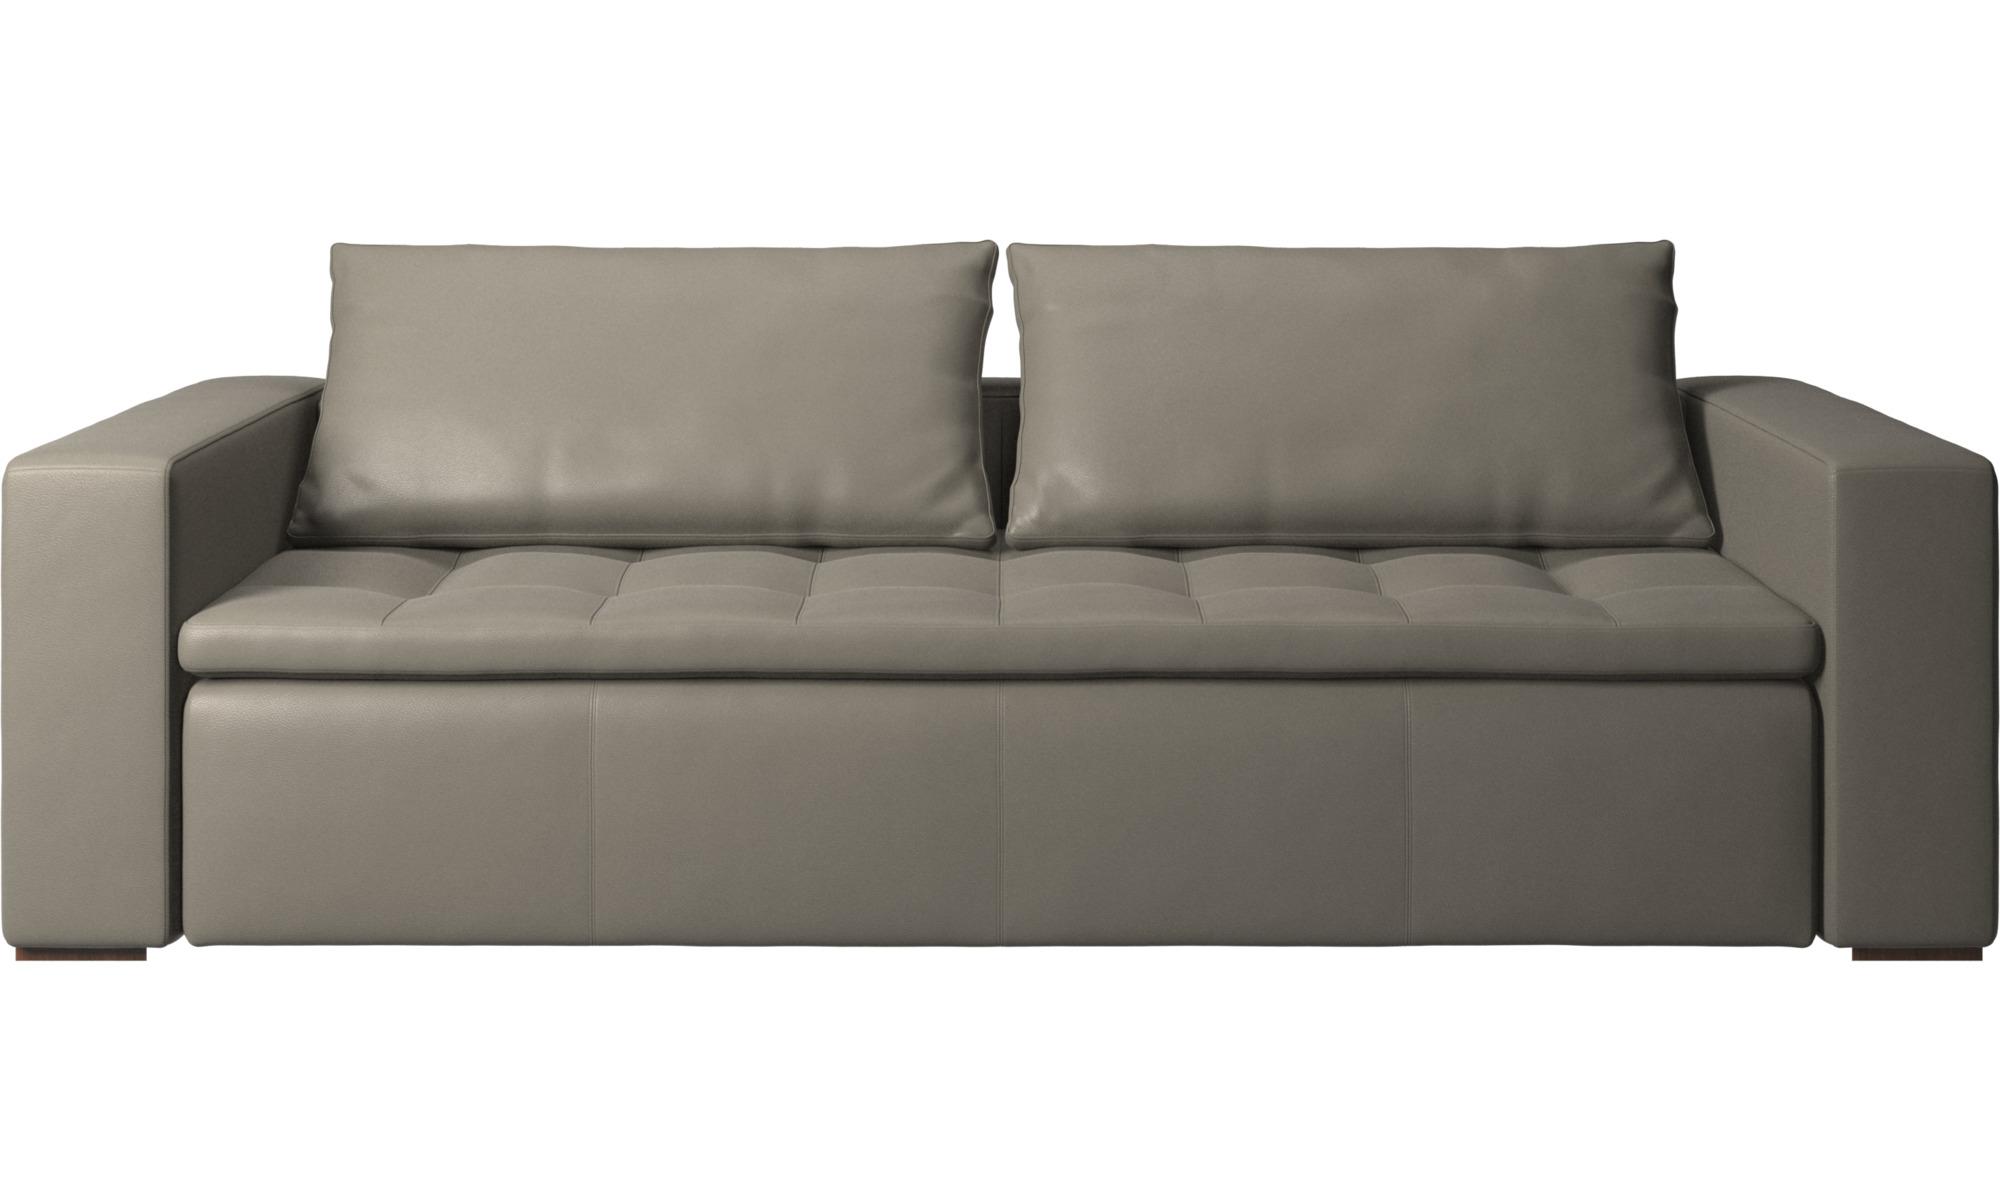 3 personers sofaer - Mezzo sofa - Grå - Læder